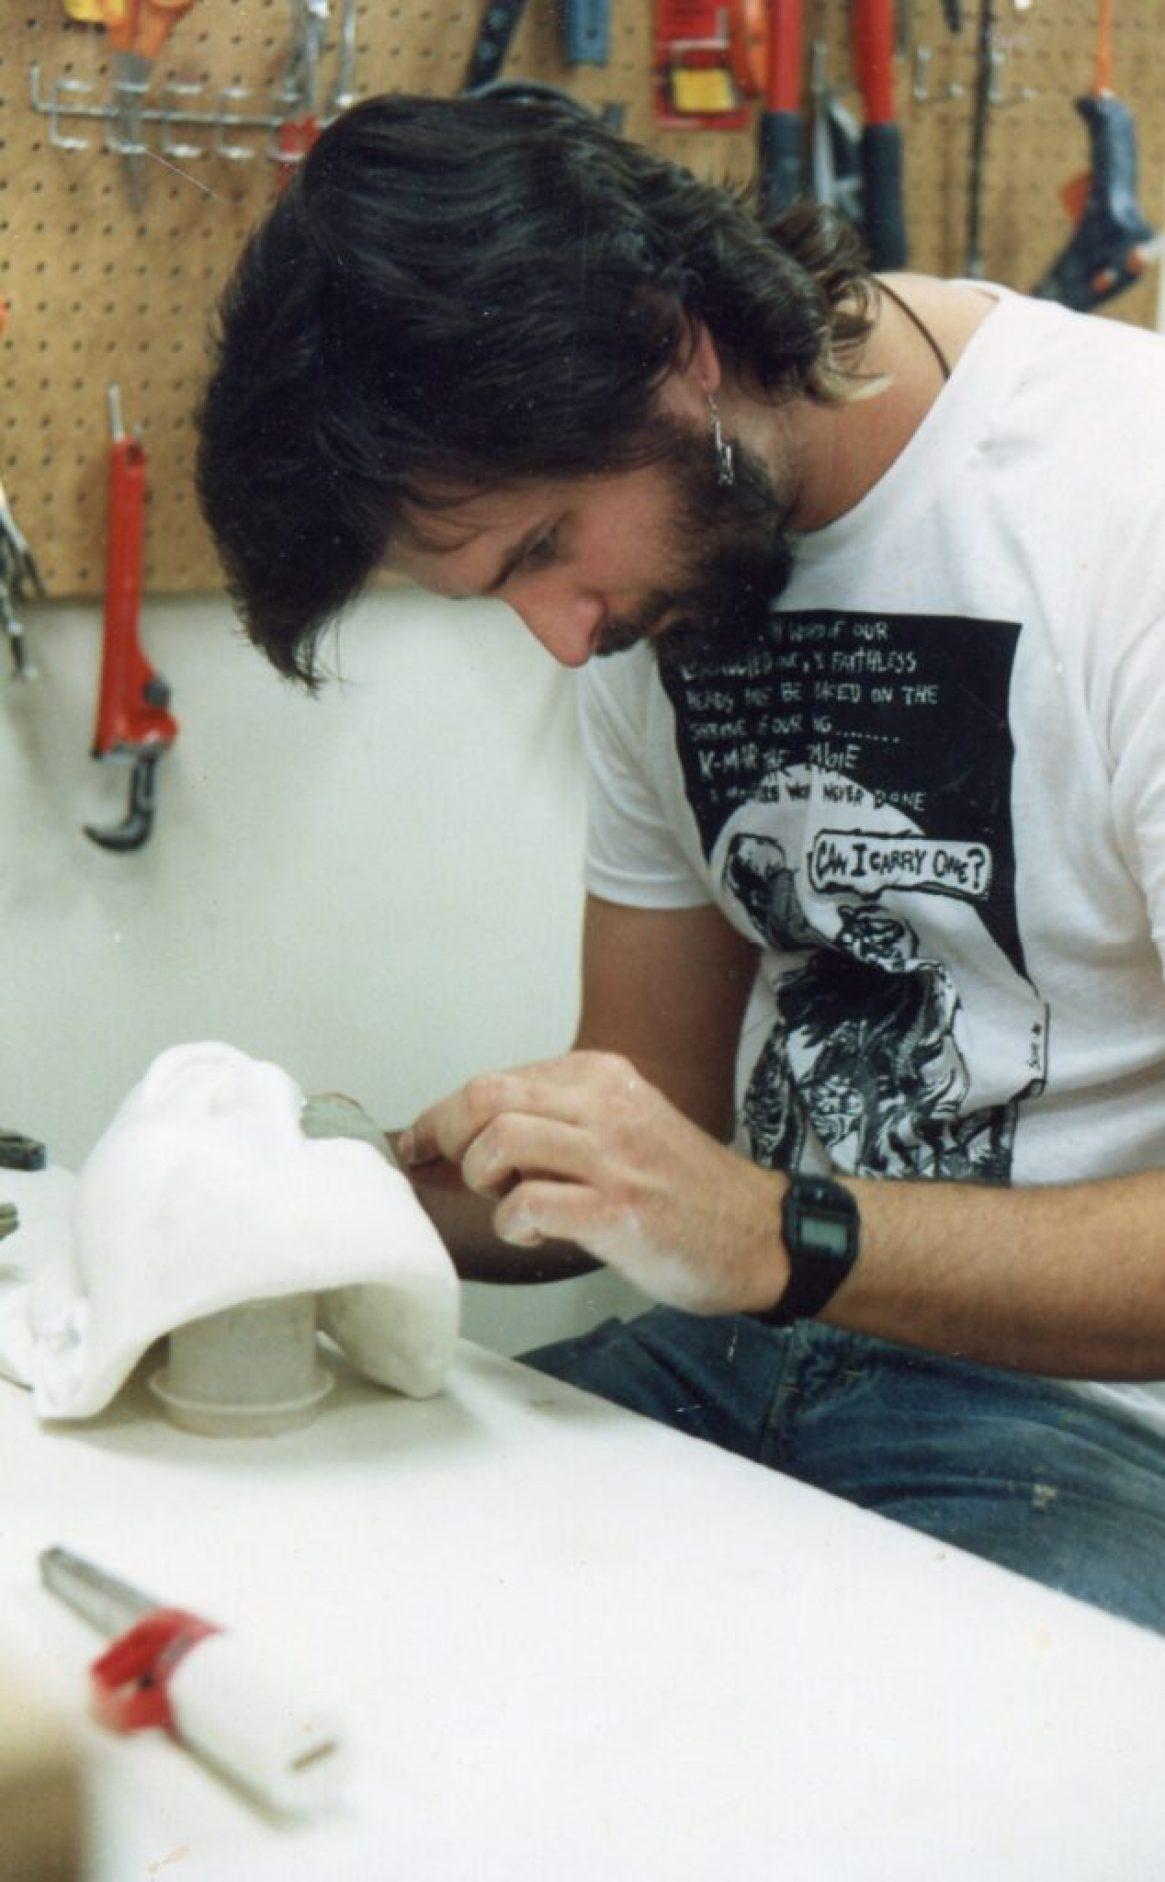 Sculpting Something